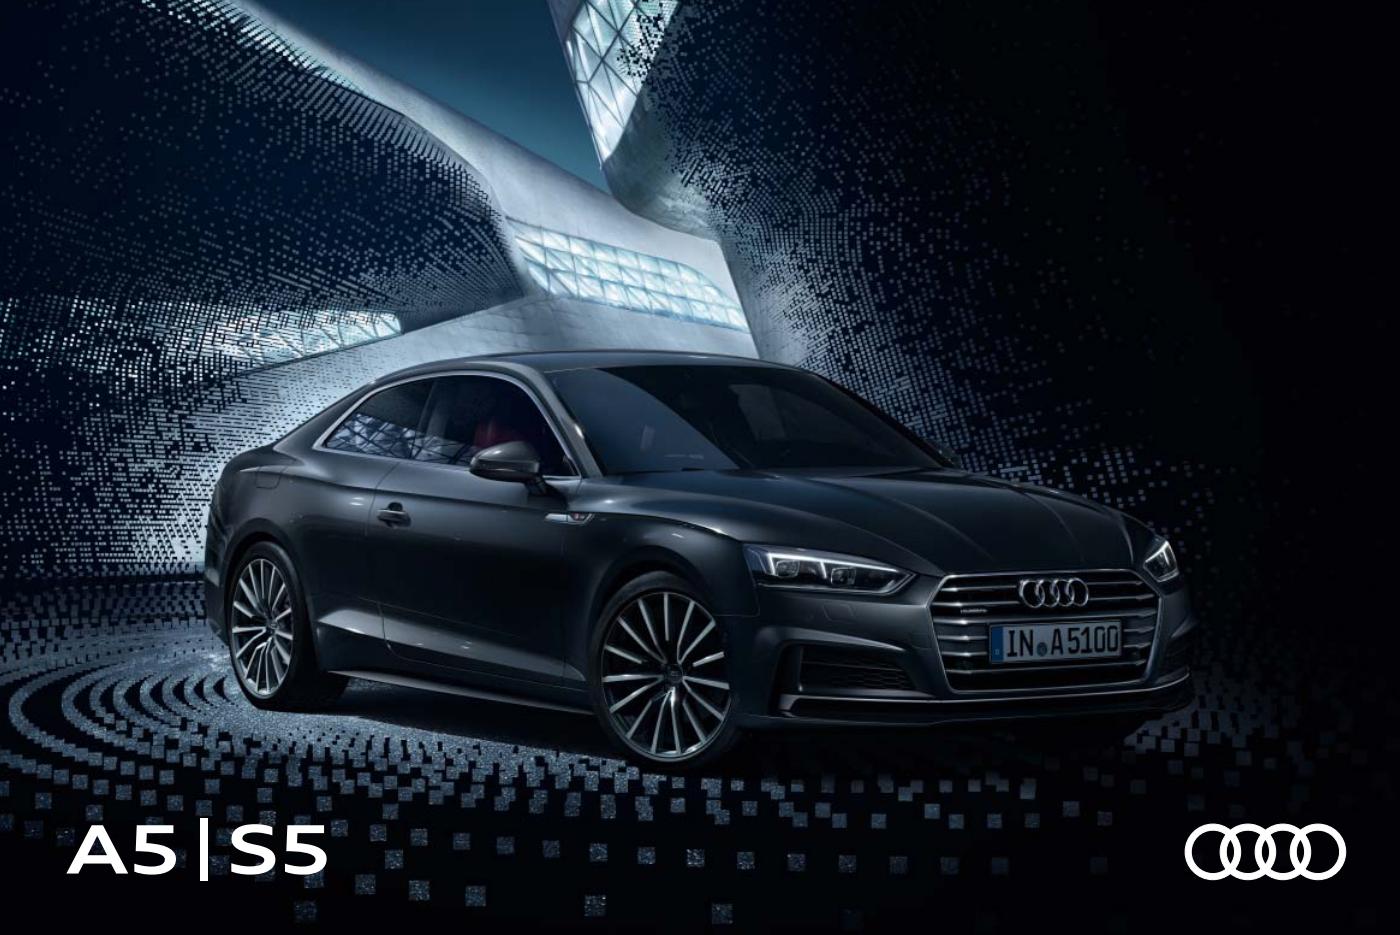 Audi_a5_s5_f2_rus_brochure_06.2016.jpg